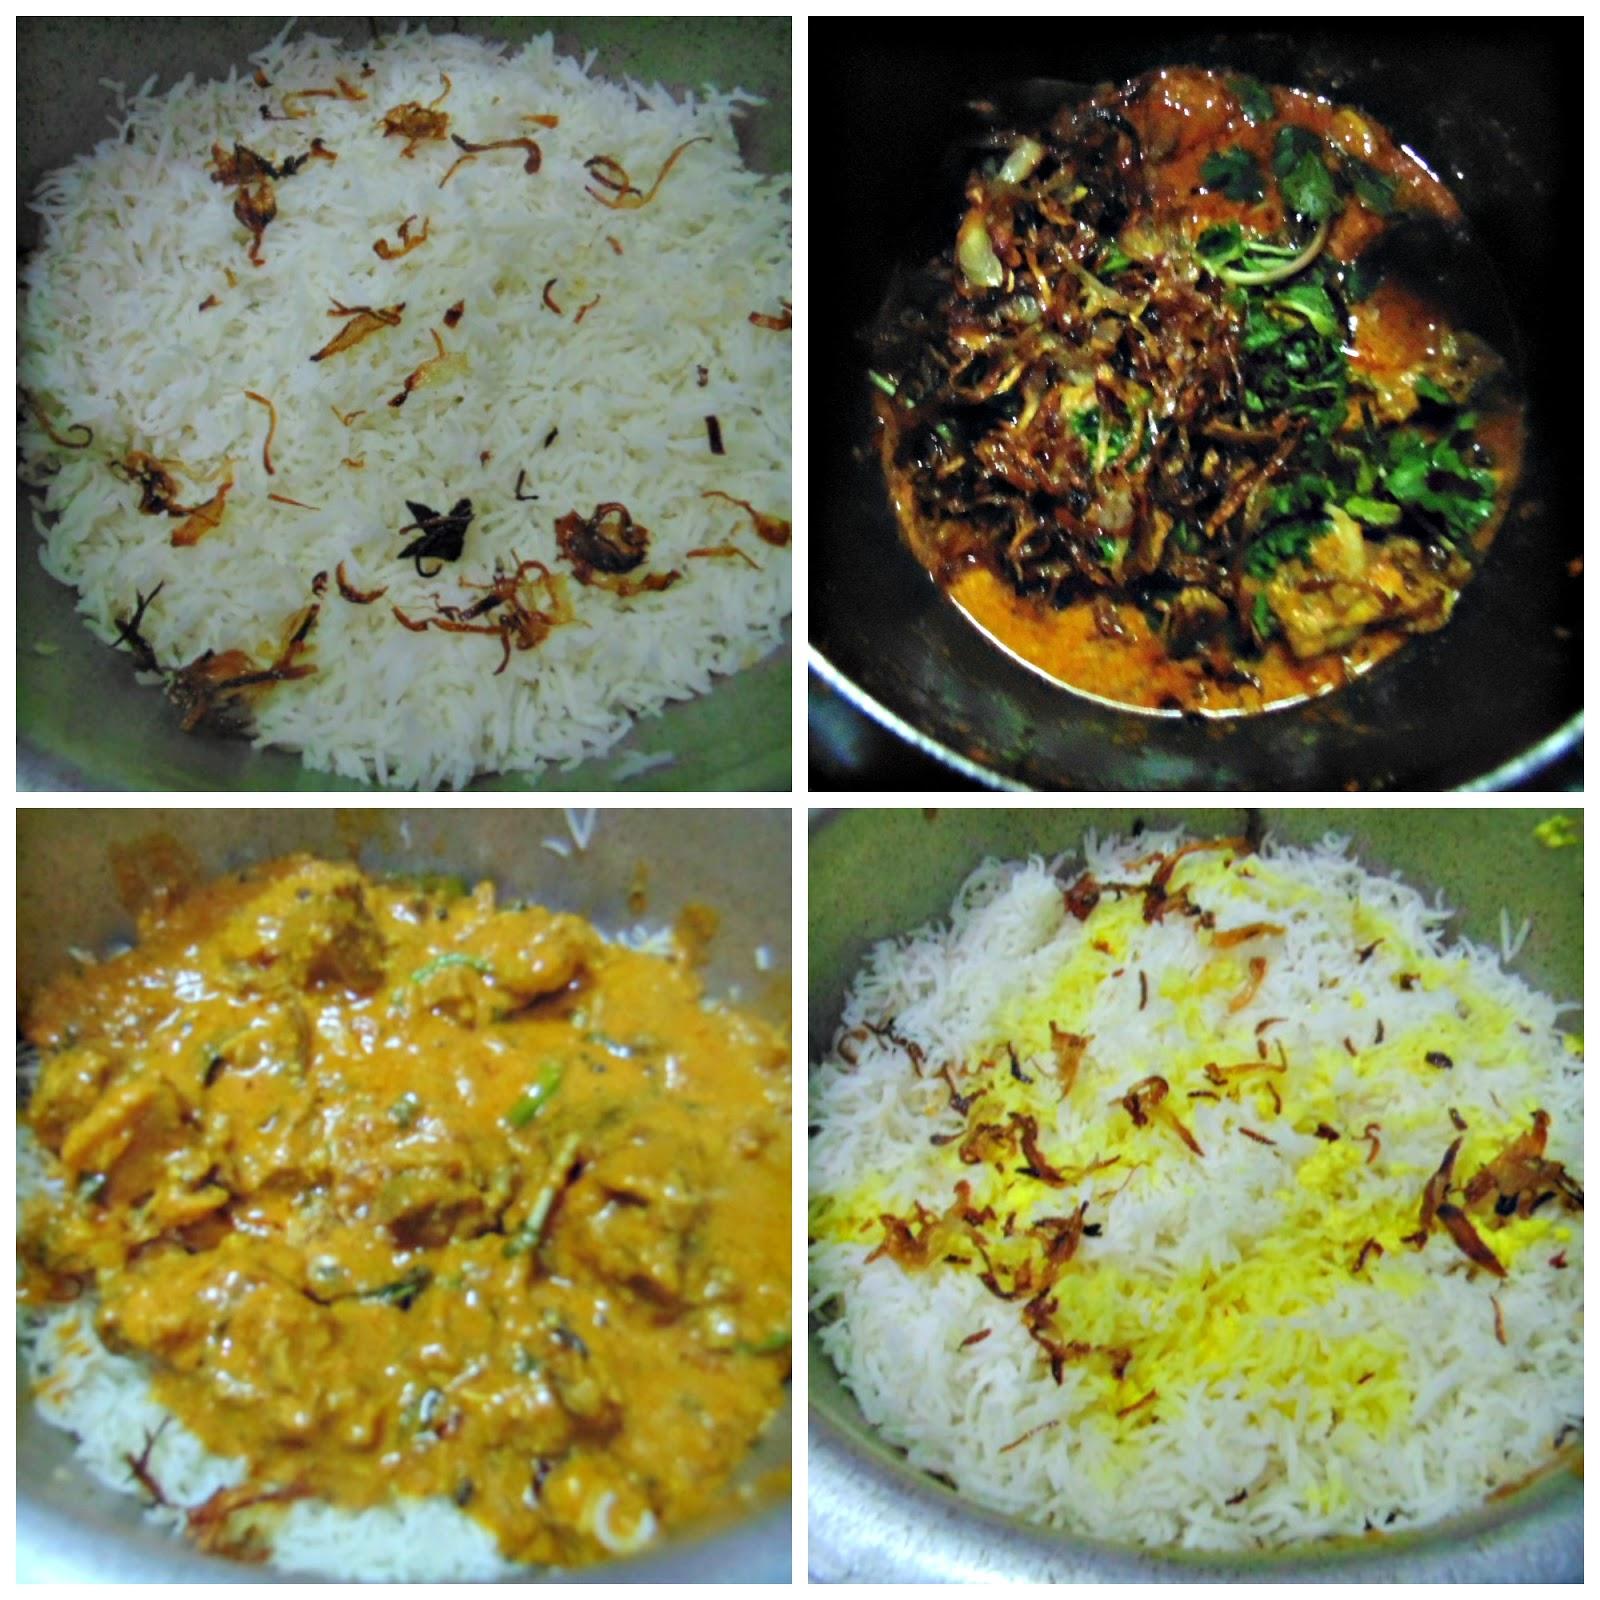 mutton mughlai biryani recipemughlai mutton biryani